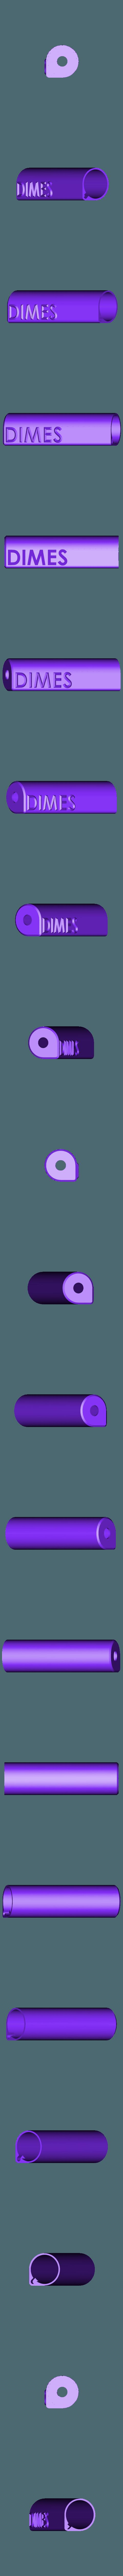 Dime Roll.stl Download free STL file Coin Rolls • Design to 3D print, Hom3d